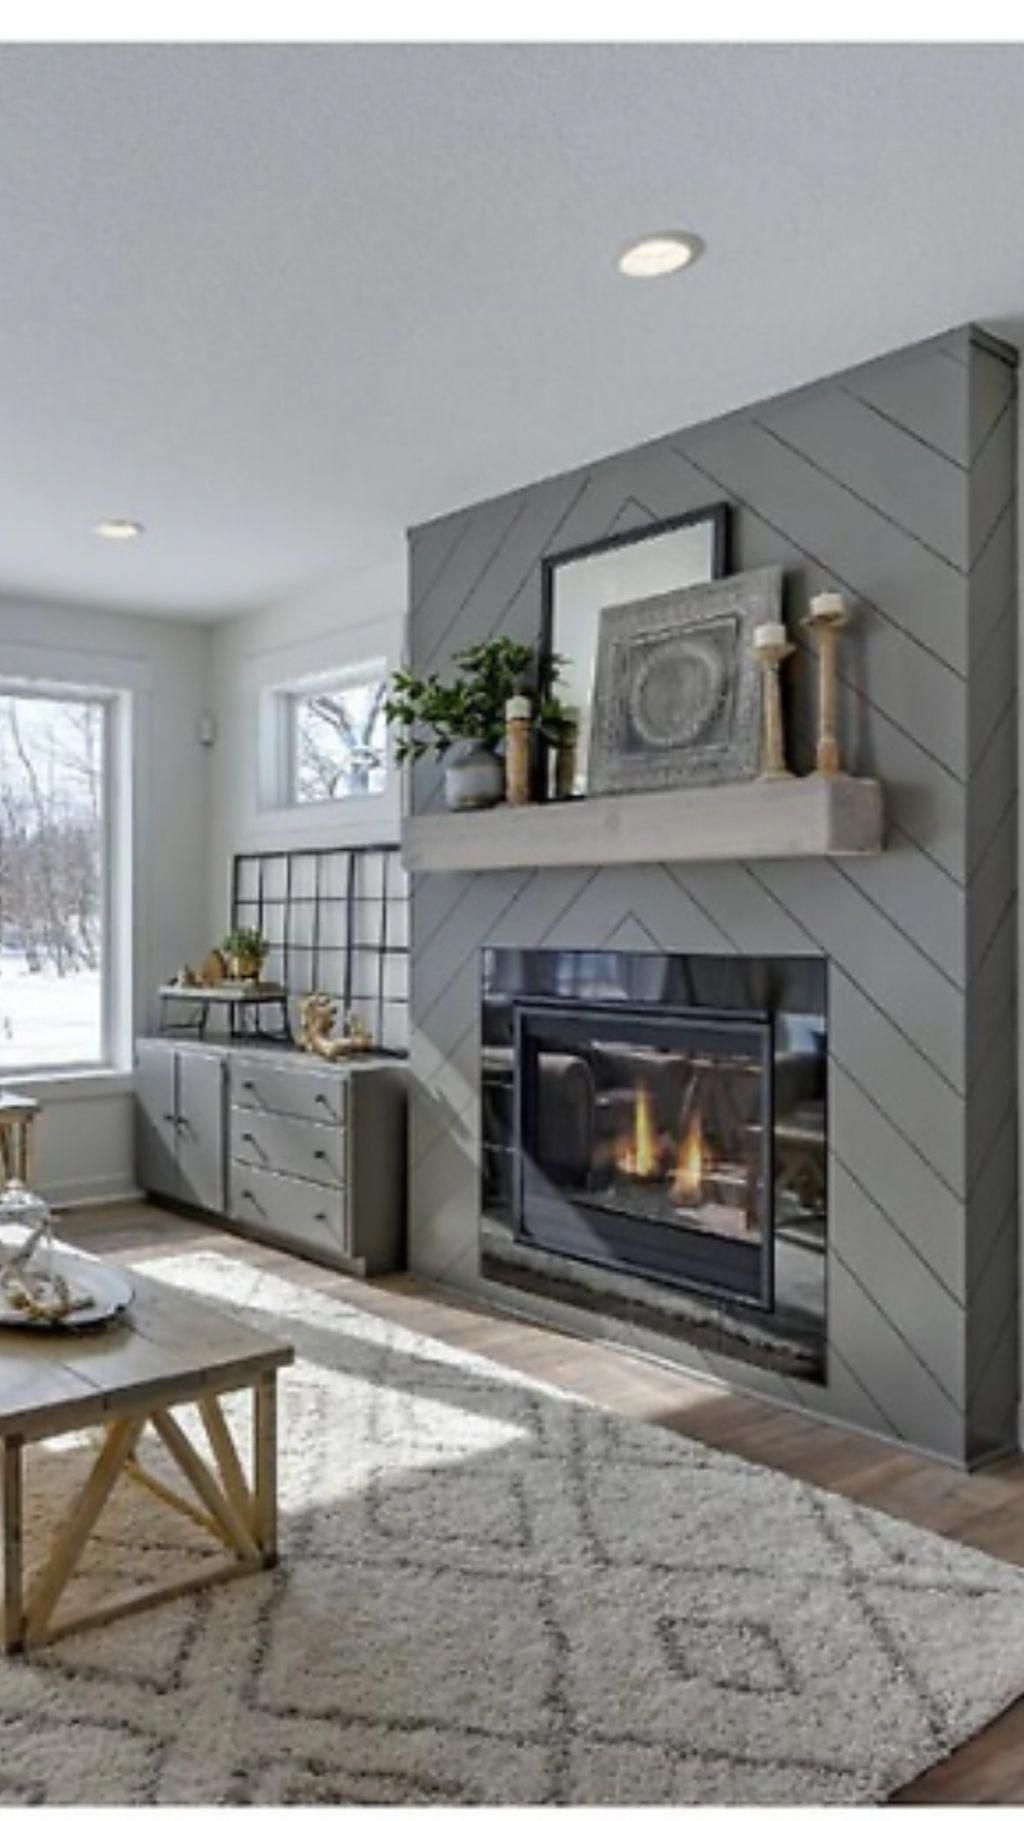 46 Gorgeous Modern Farmhouse Fireplace Ideas You Should ...